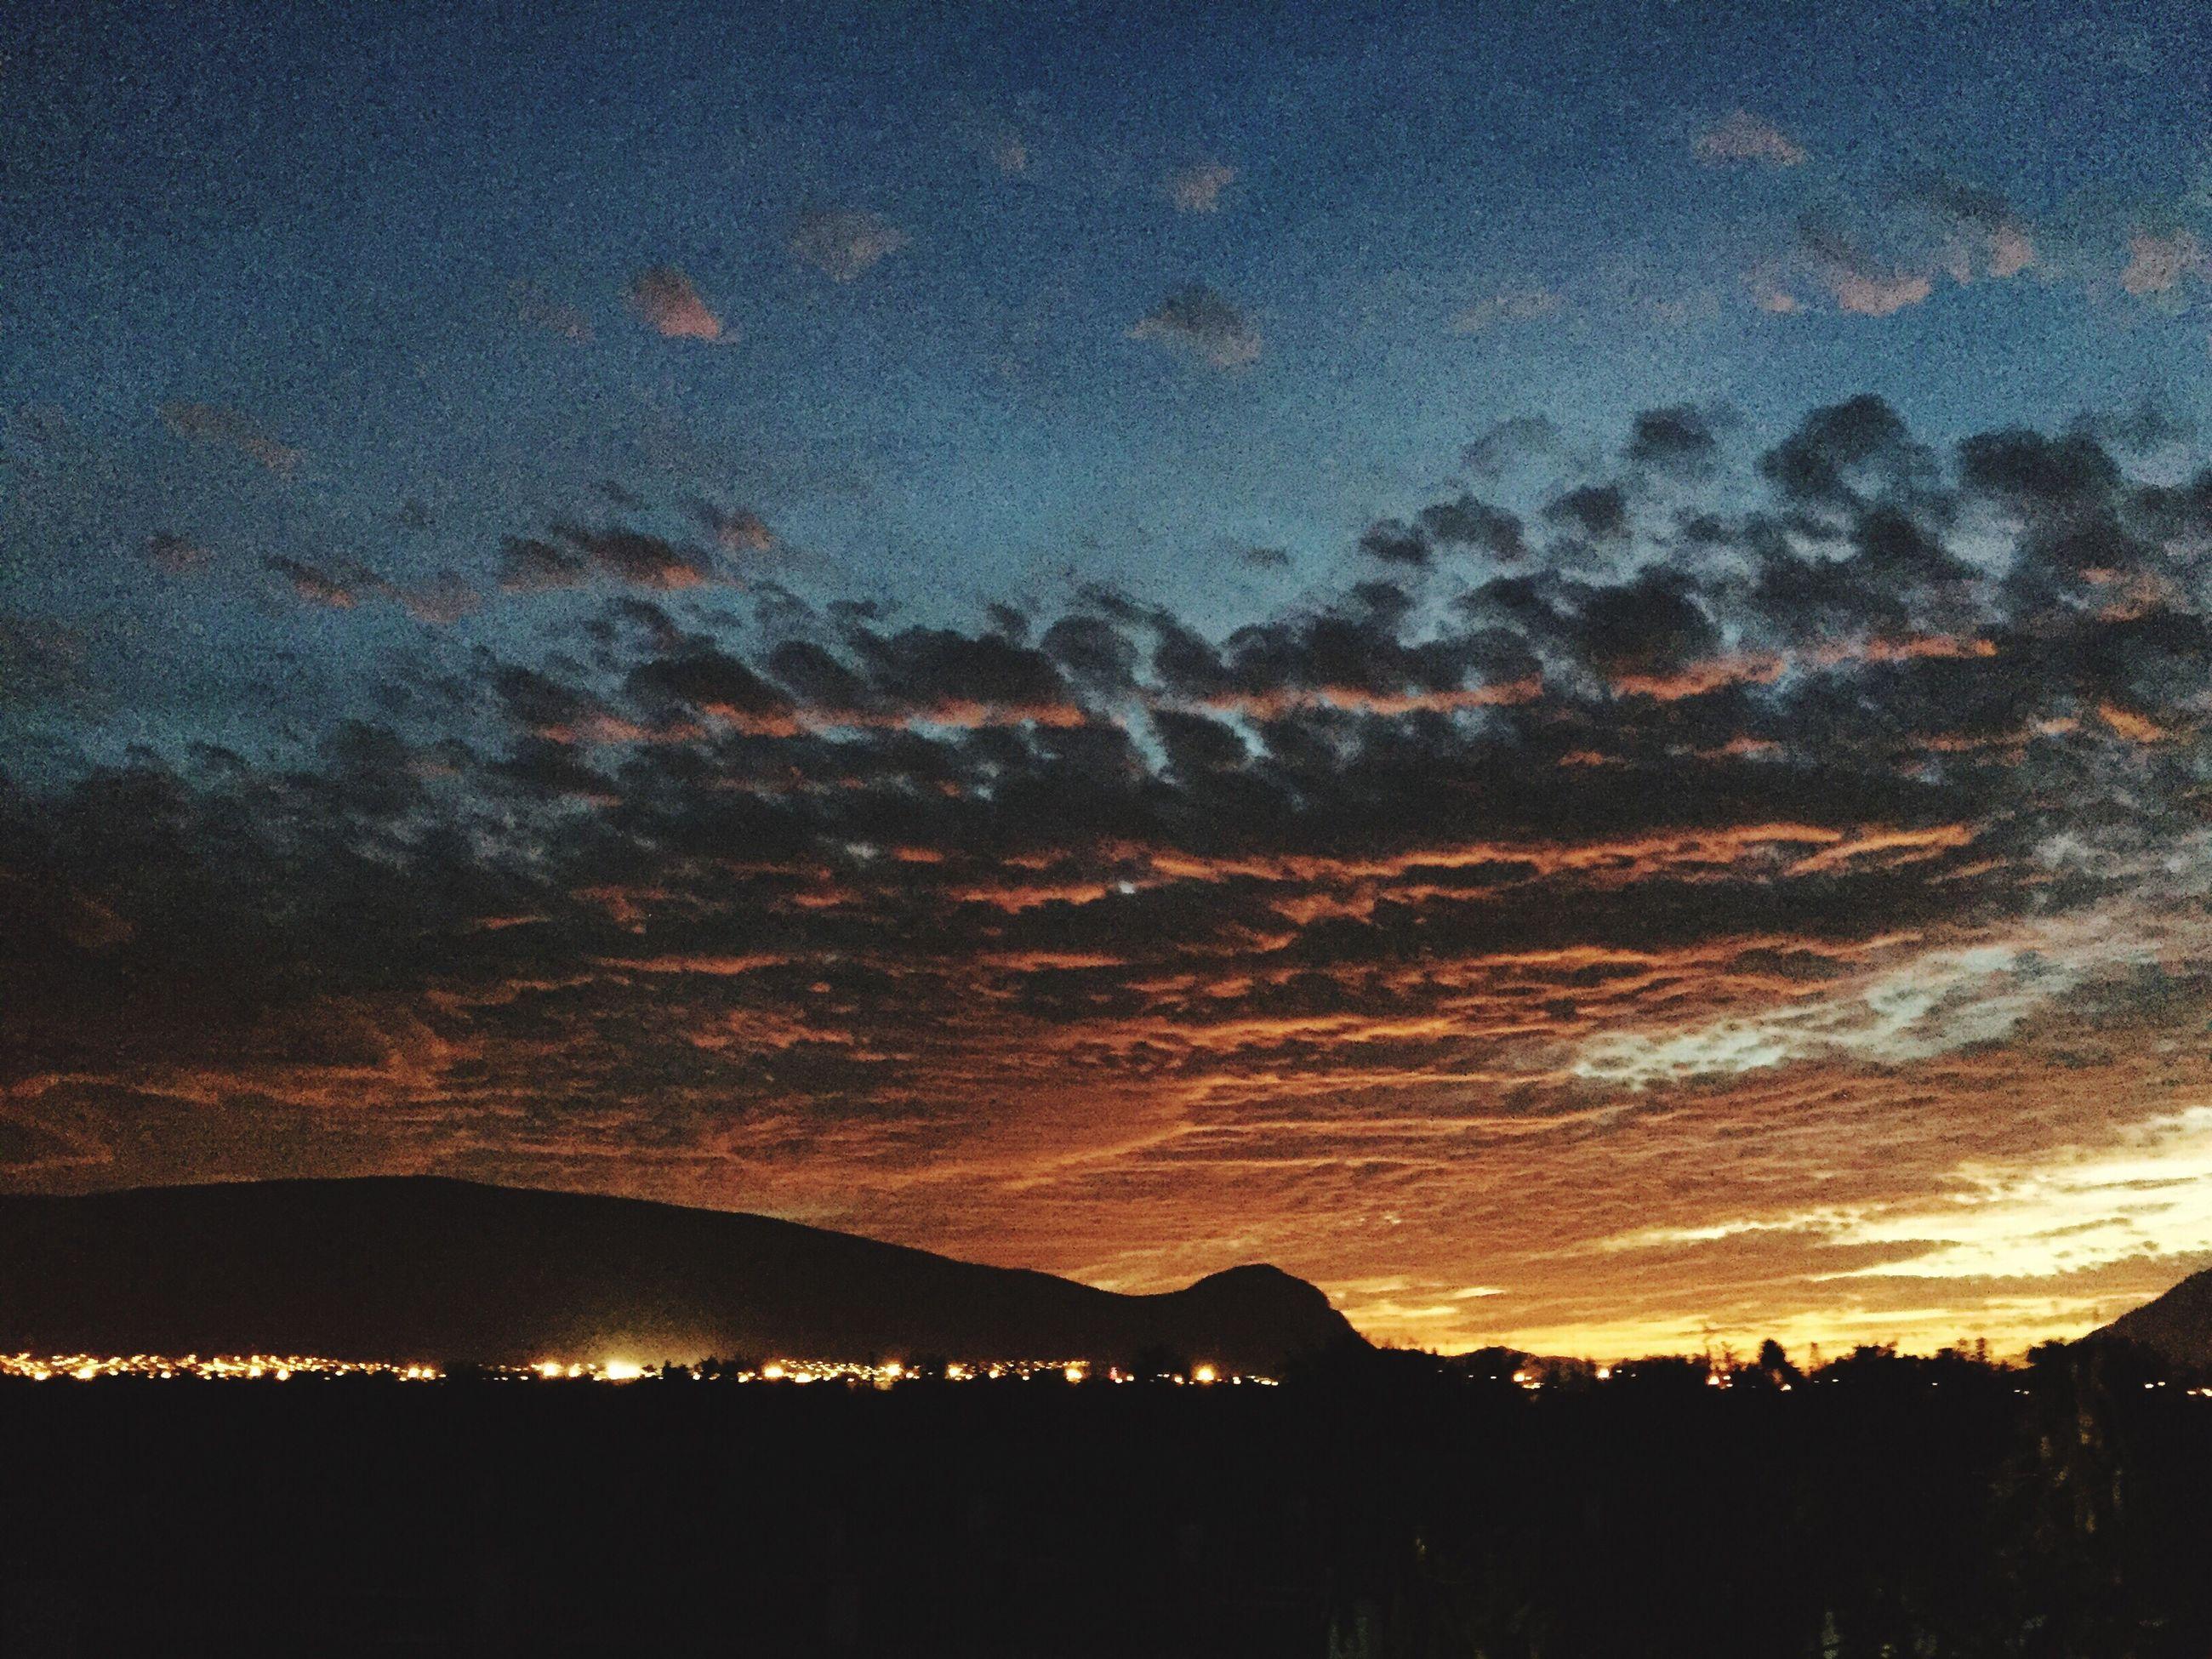 sunset, scenics, silhouette, sky, beauty in nature, tranquil scene, tranquility, nature, landscape, idyllic, dusk, orange color, cloud - sky, dark, illuminated, dramatic sky, night, mountain, majestic, outdoors